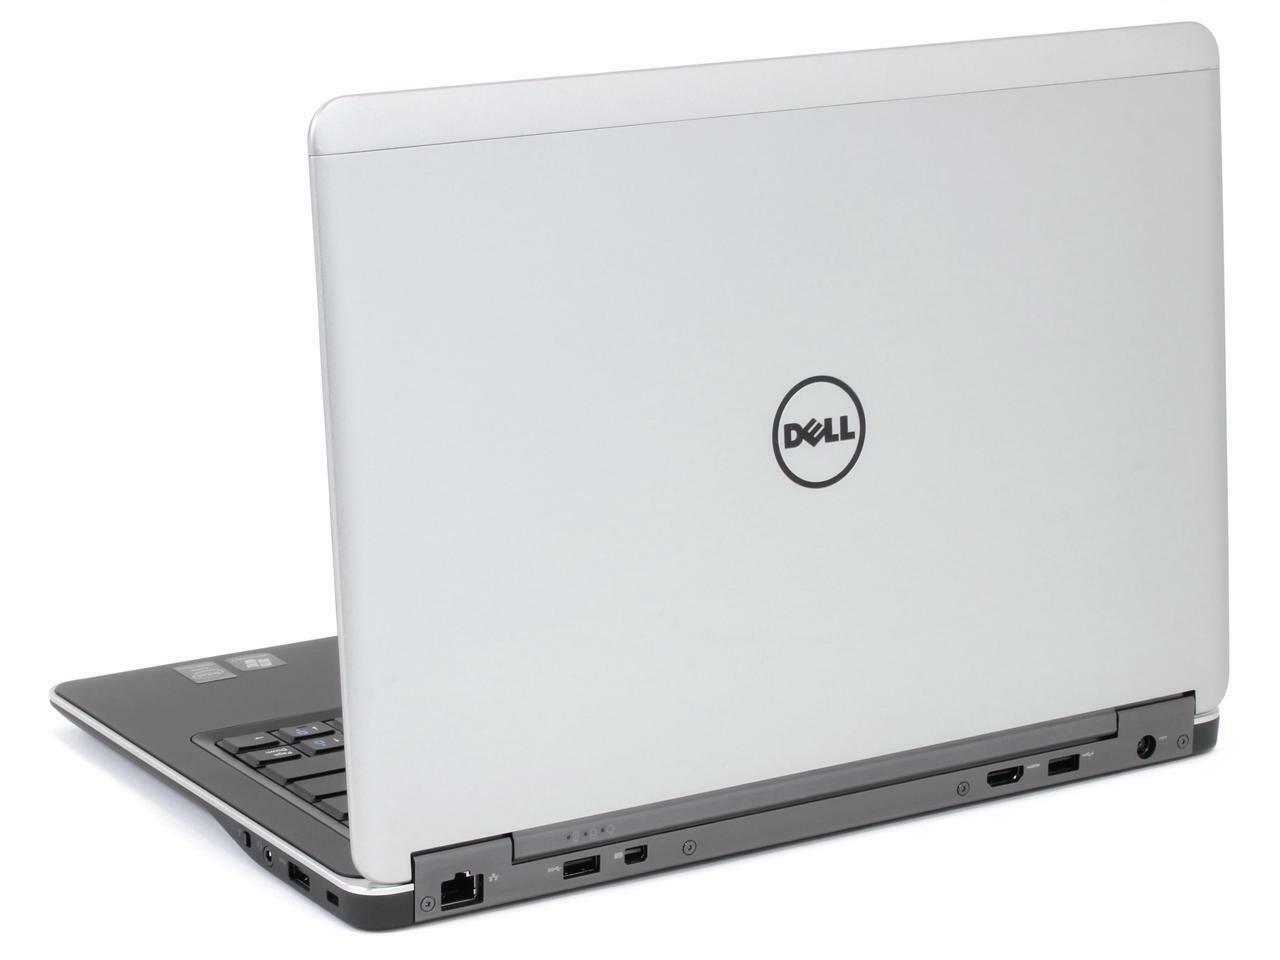 Laptop Windows - Dell Latitude Business Gaming Laptop Windows 10 Intel Core i5 16GB RAM 2TB SSD